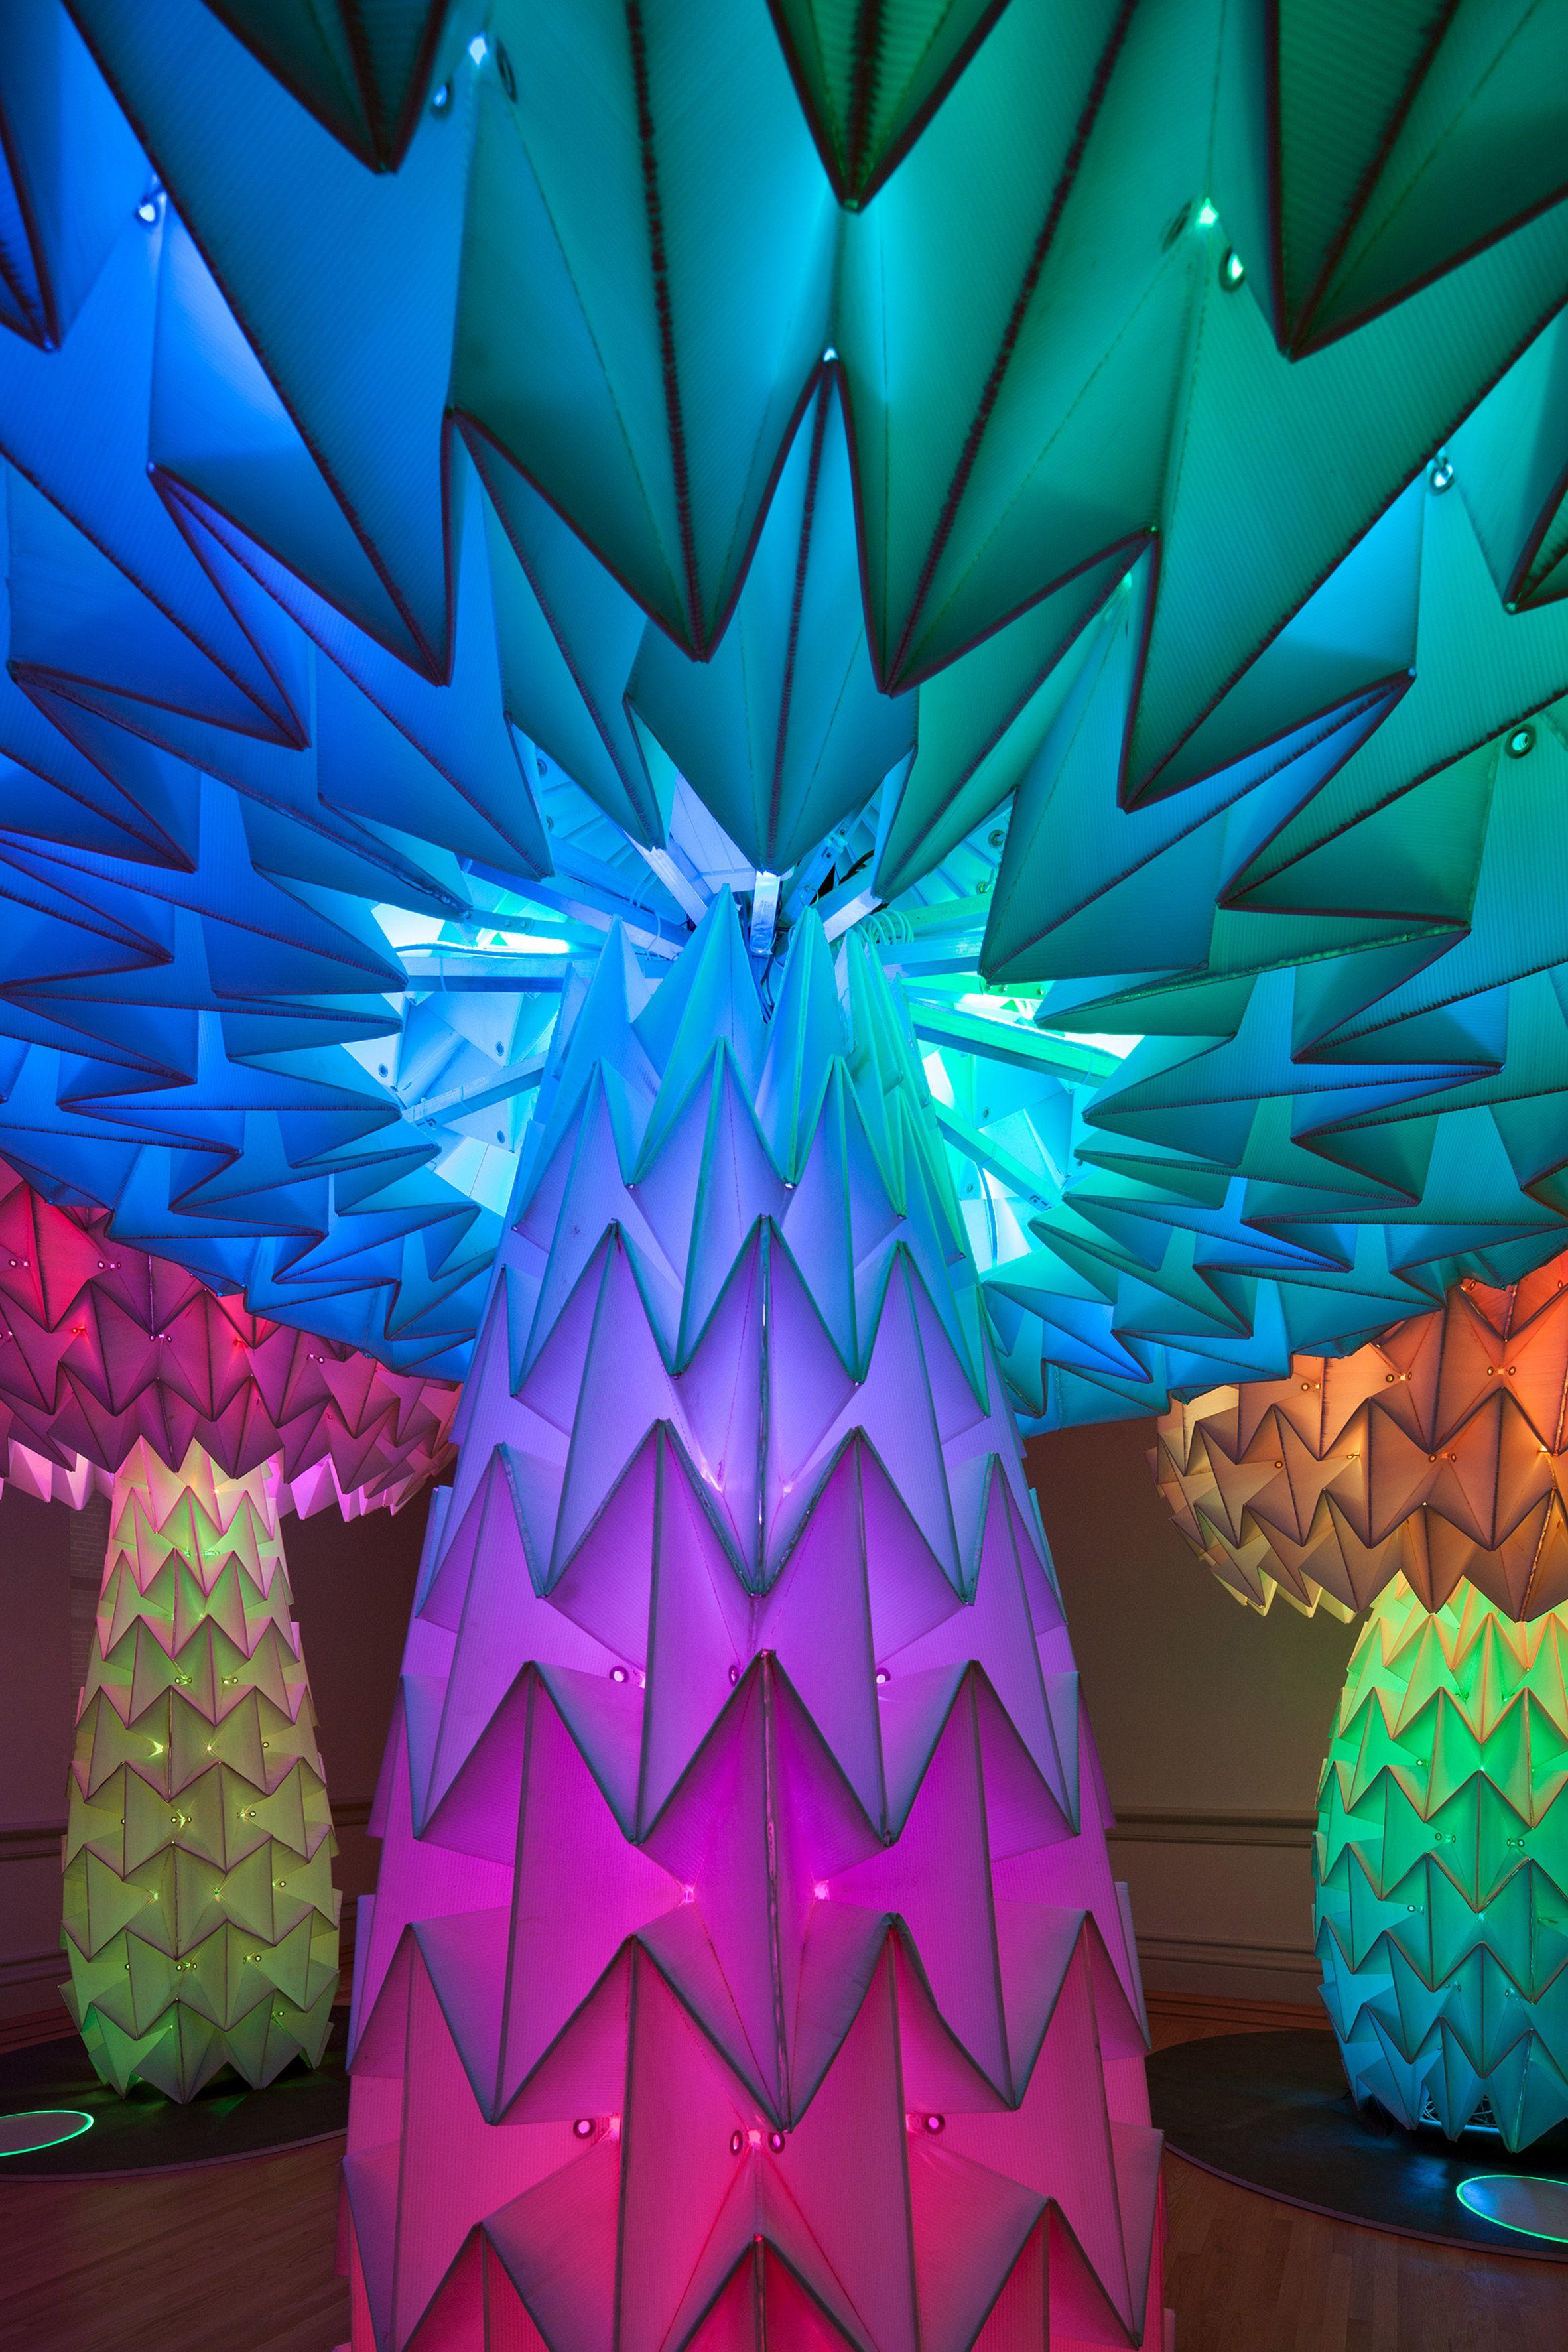 The Art of Burning Man is explored in Washington DC